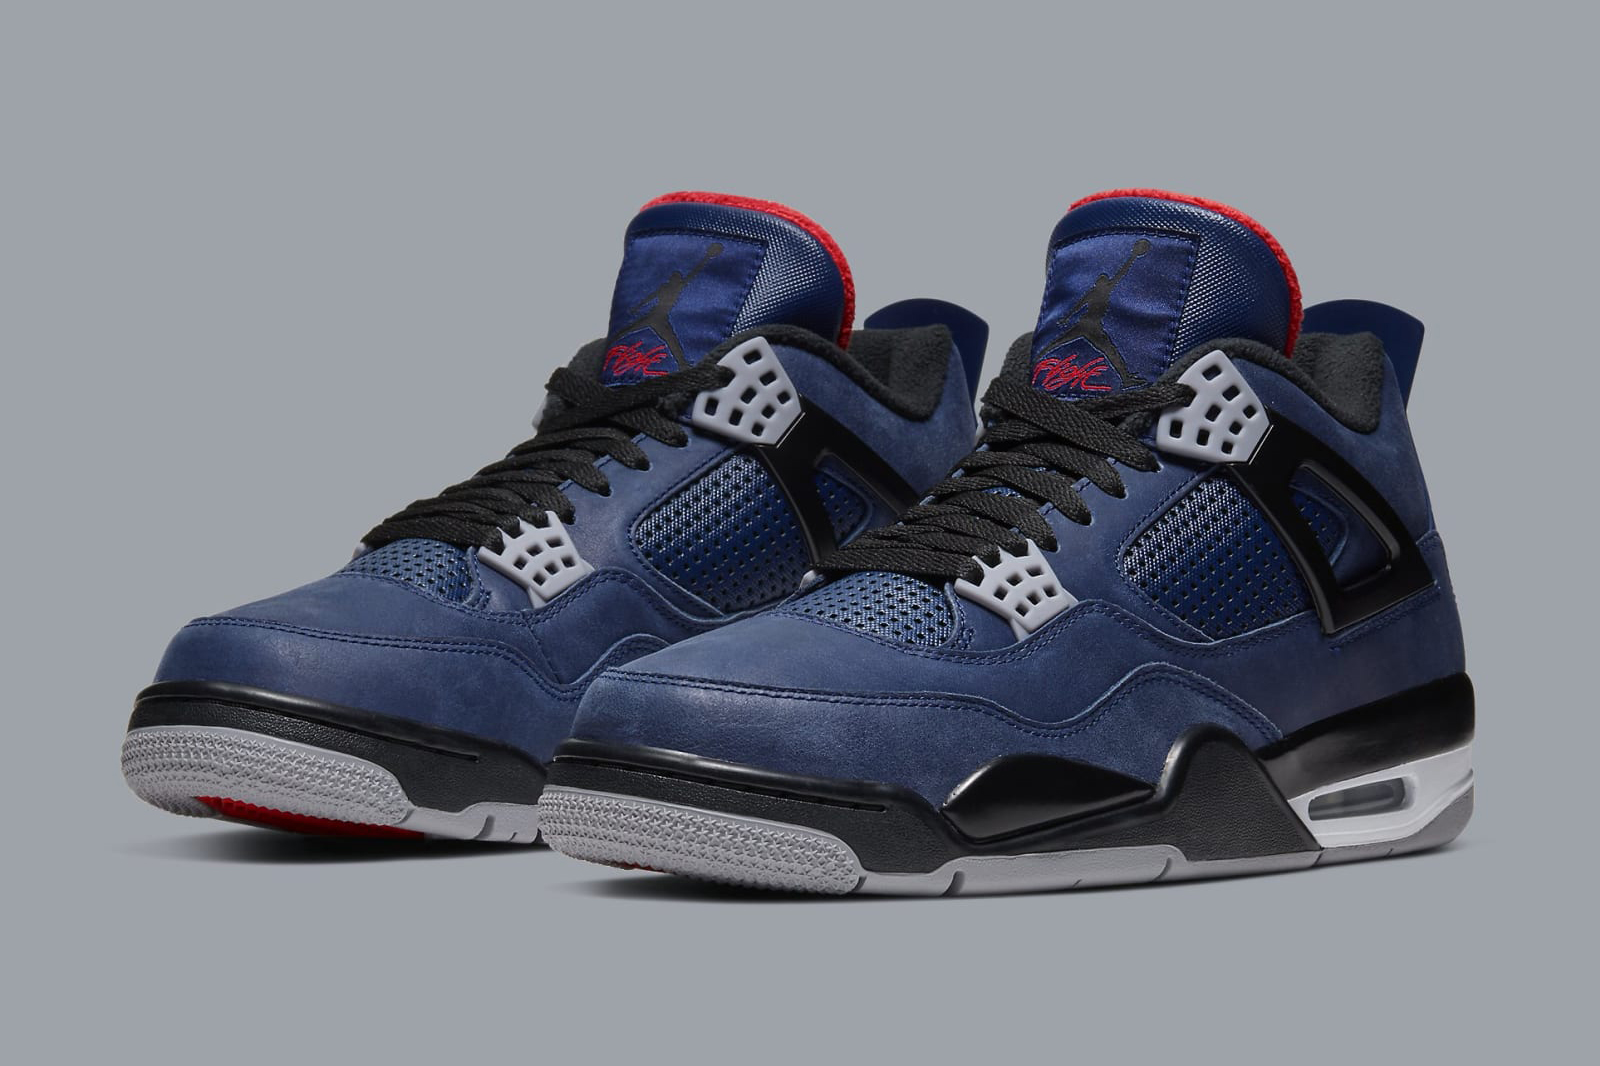 Air Jordan 4 Retro WNTR「Loyal Blue」鞋款官方图辑公开